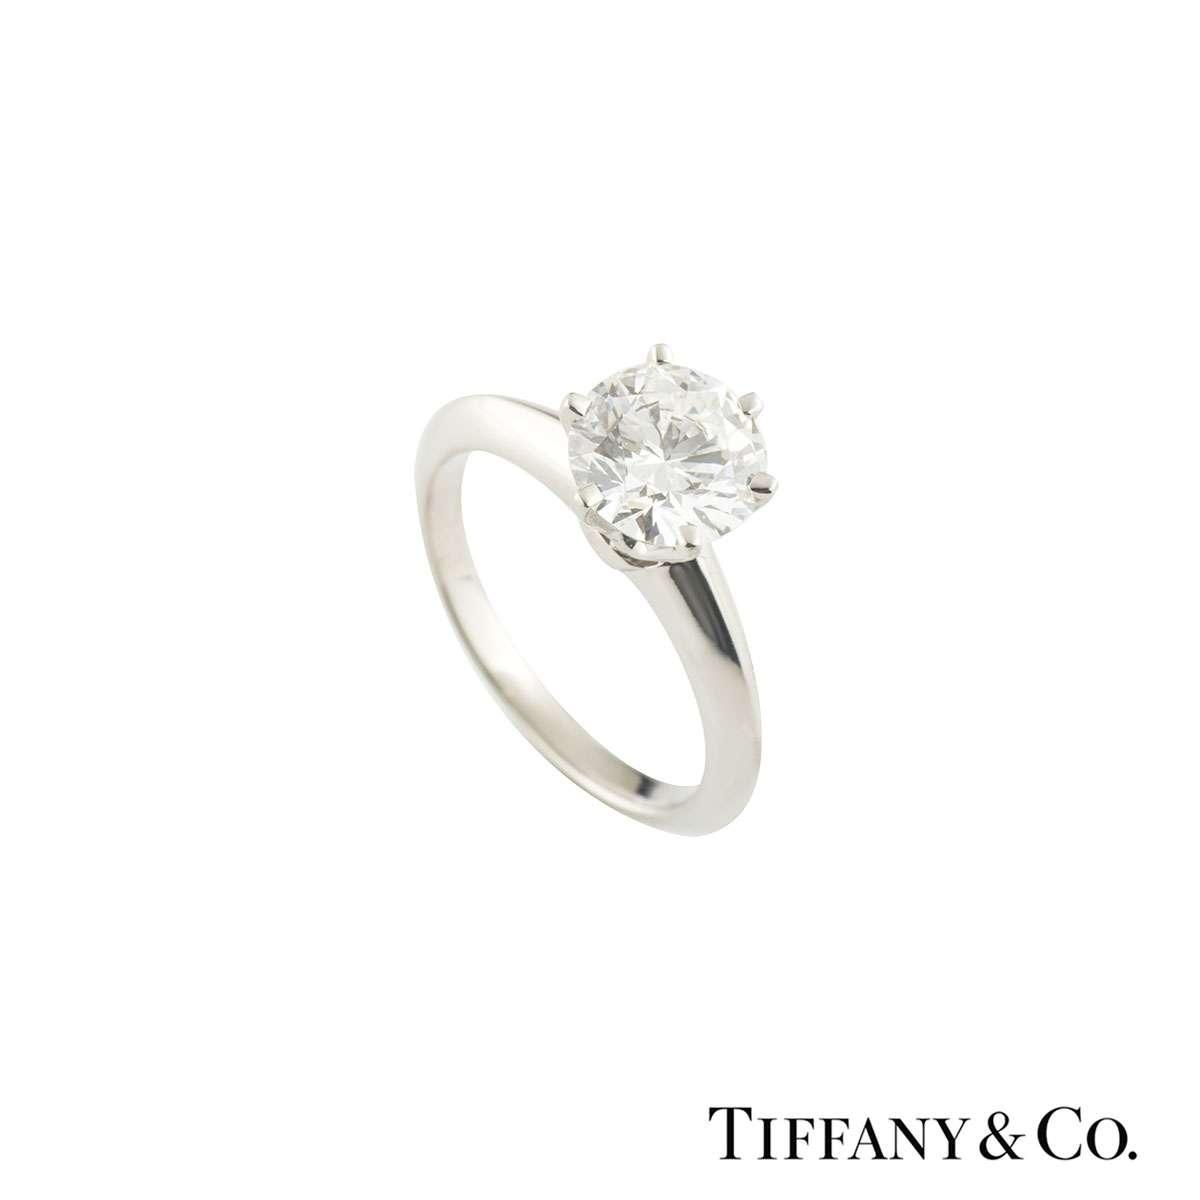 Tiffany & Co. Setting Band Ring 1.26ct F/VS1